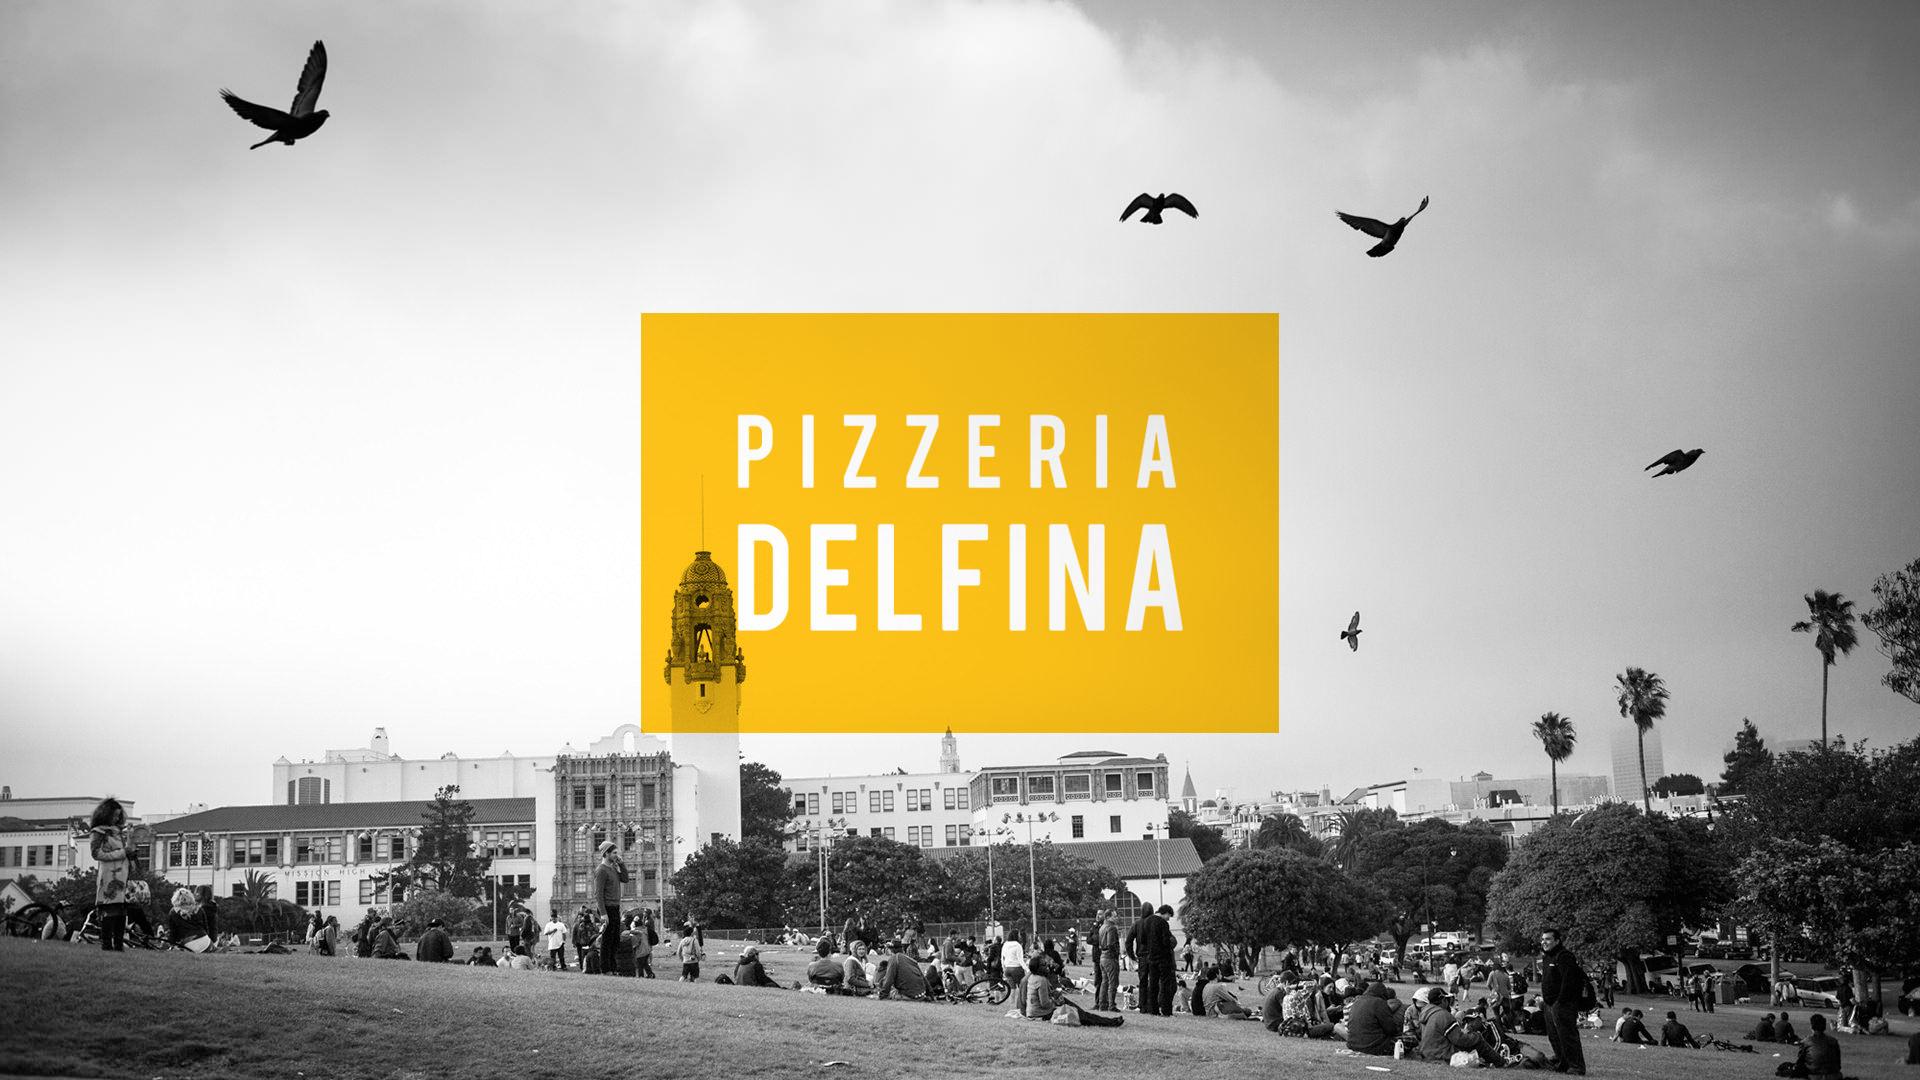 Pizzeria Delfina branding by Character San Fransisco